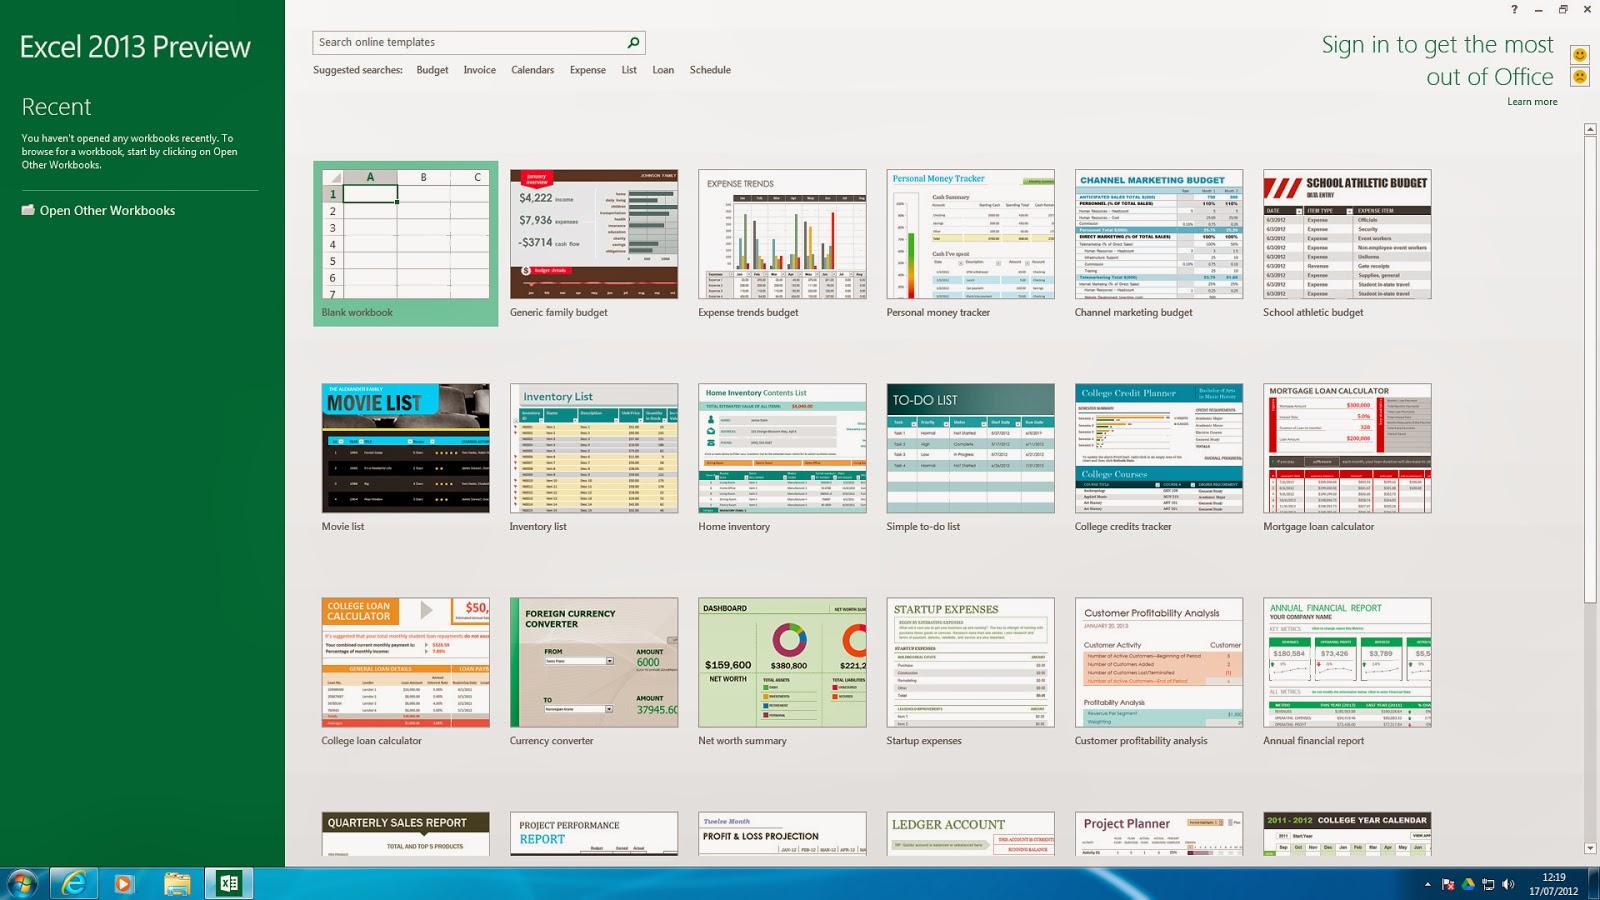 Microsoft Office Professional Plus 2013 Excel